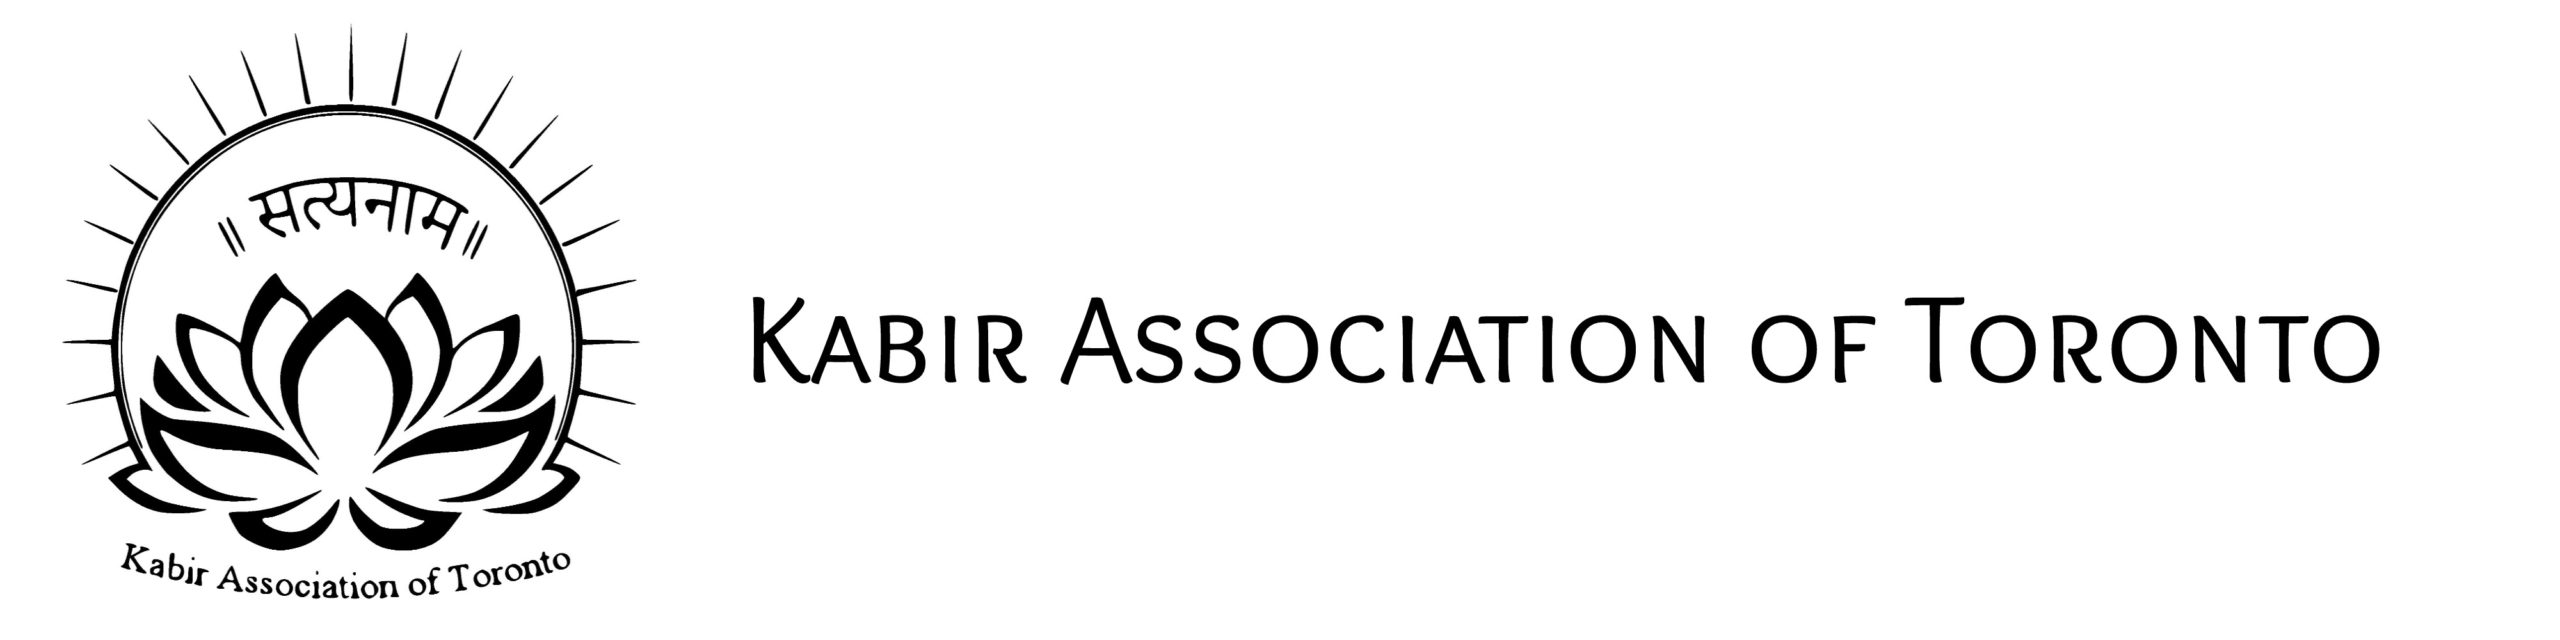 Kabir Association of Toronto